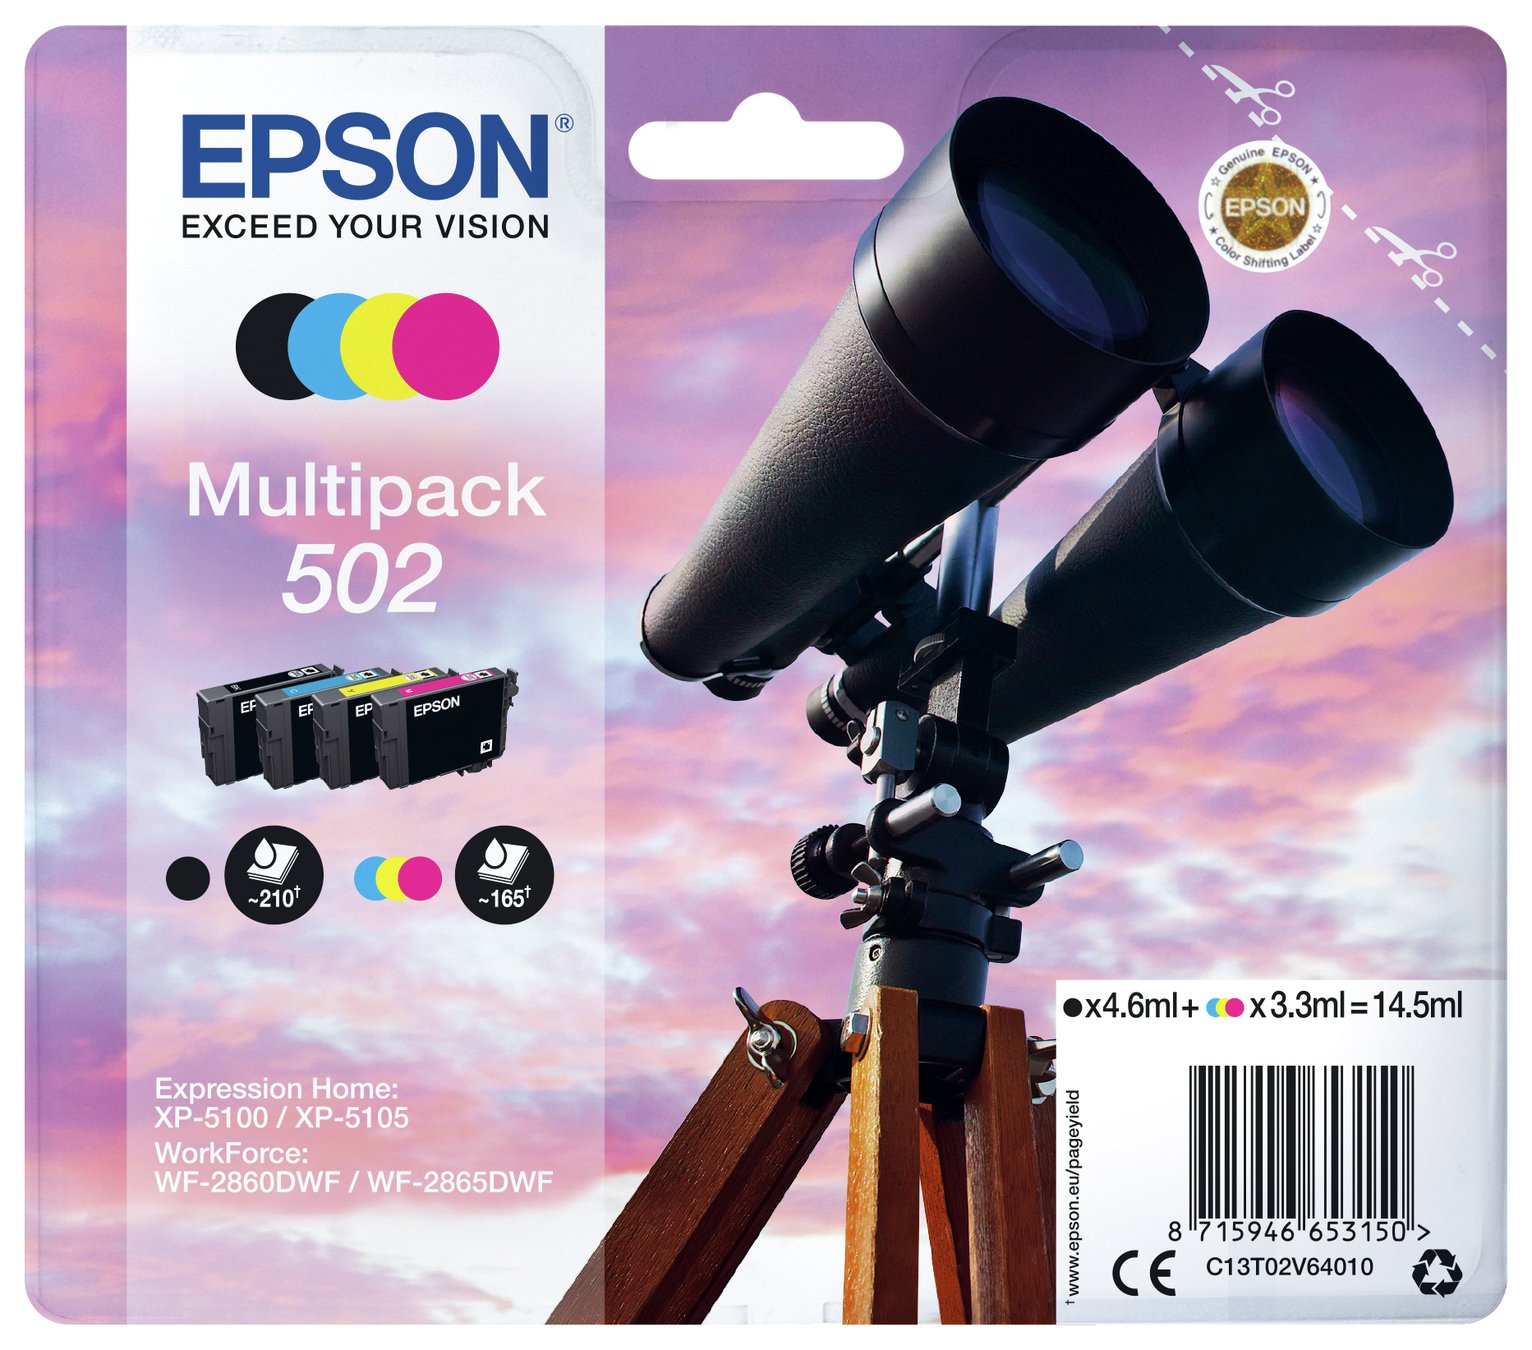 Epson 502 Binoculars Ink Cartridges - Black & Colour